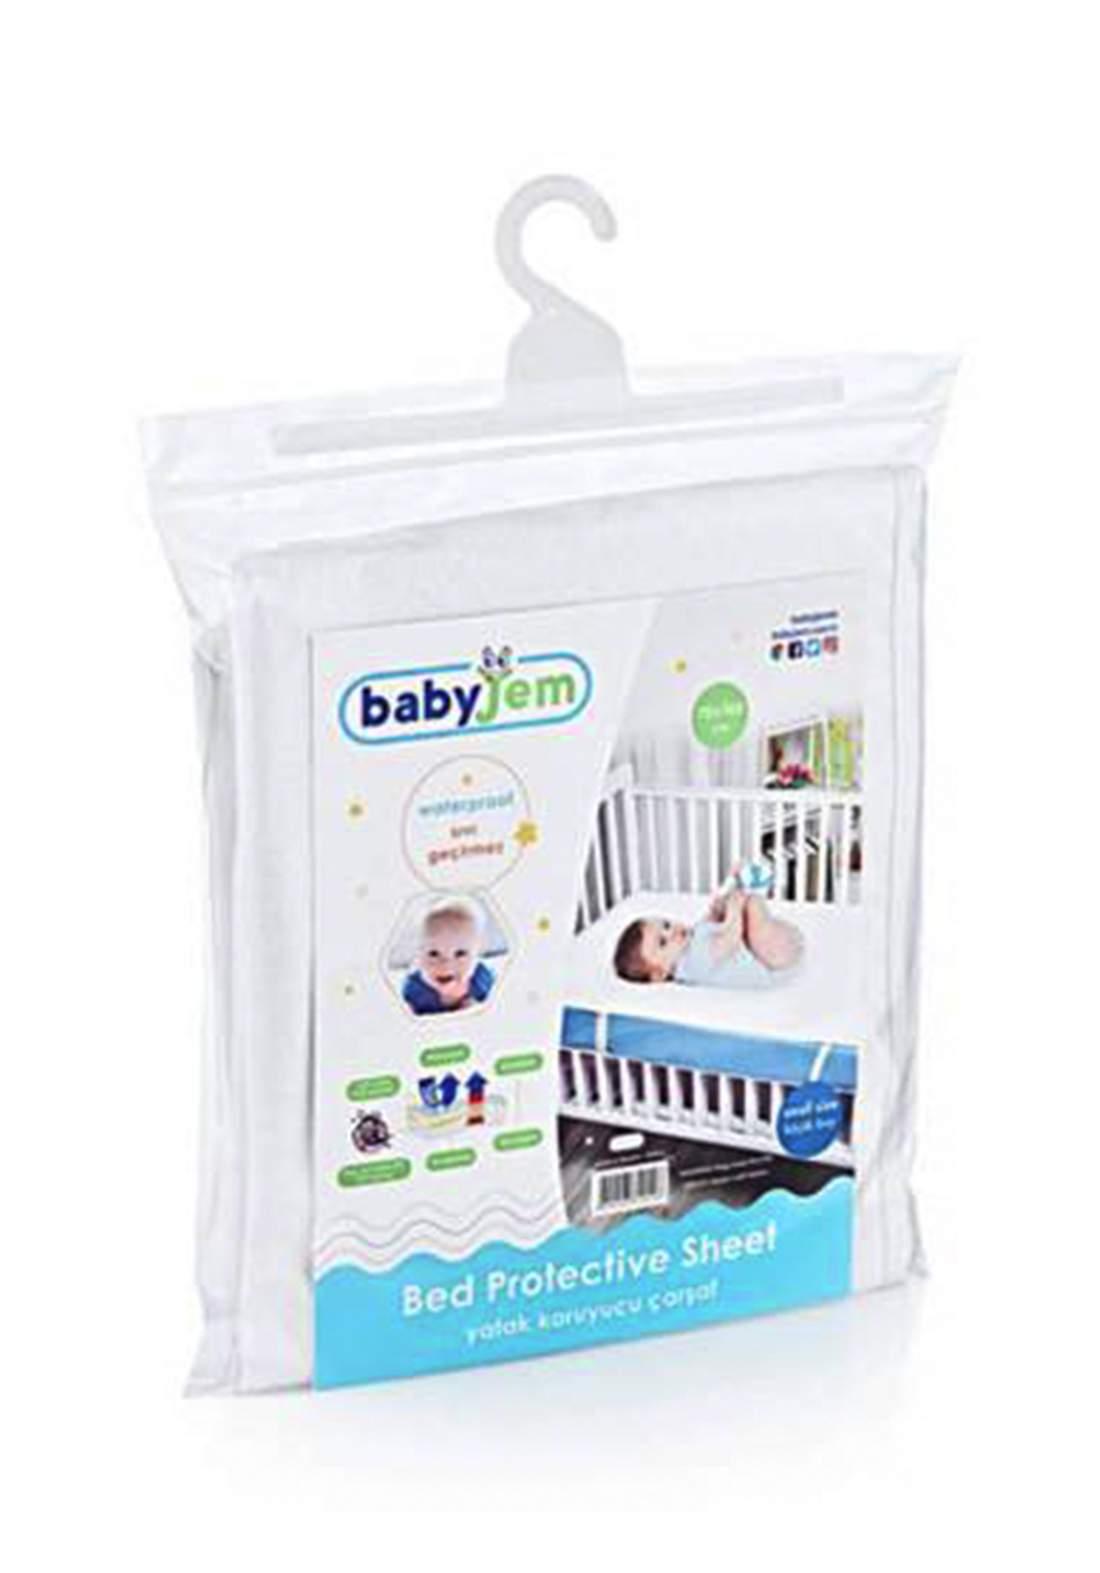 Babyjem 012 Bed Protective Sheet شرشف سرير مقاوم للماء للاطفال